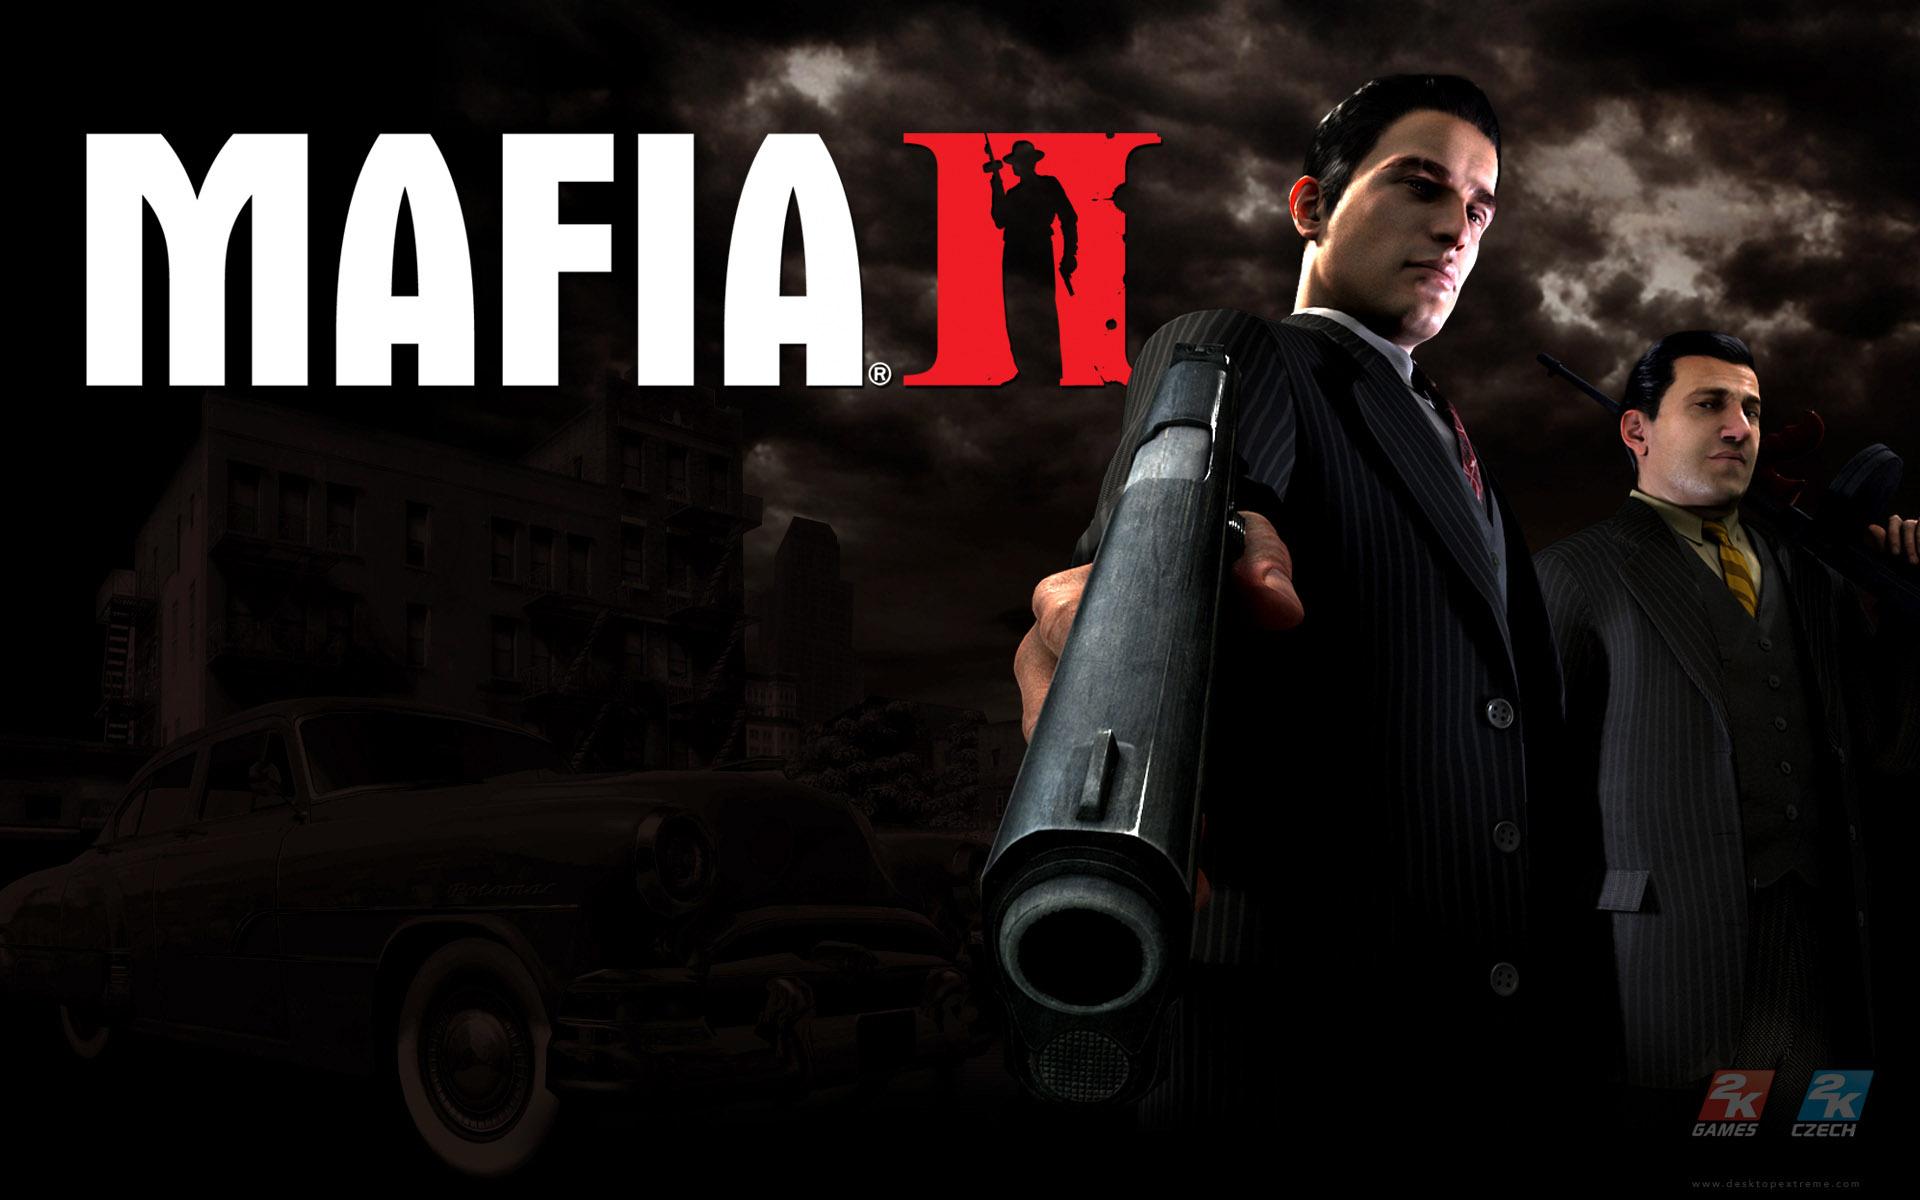 http://www.originalsoundversion.com/wp-content/uploads/2010/09/Mafia_II1.jpg